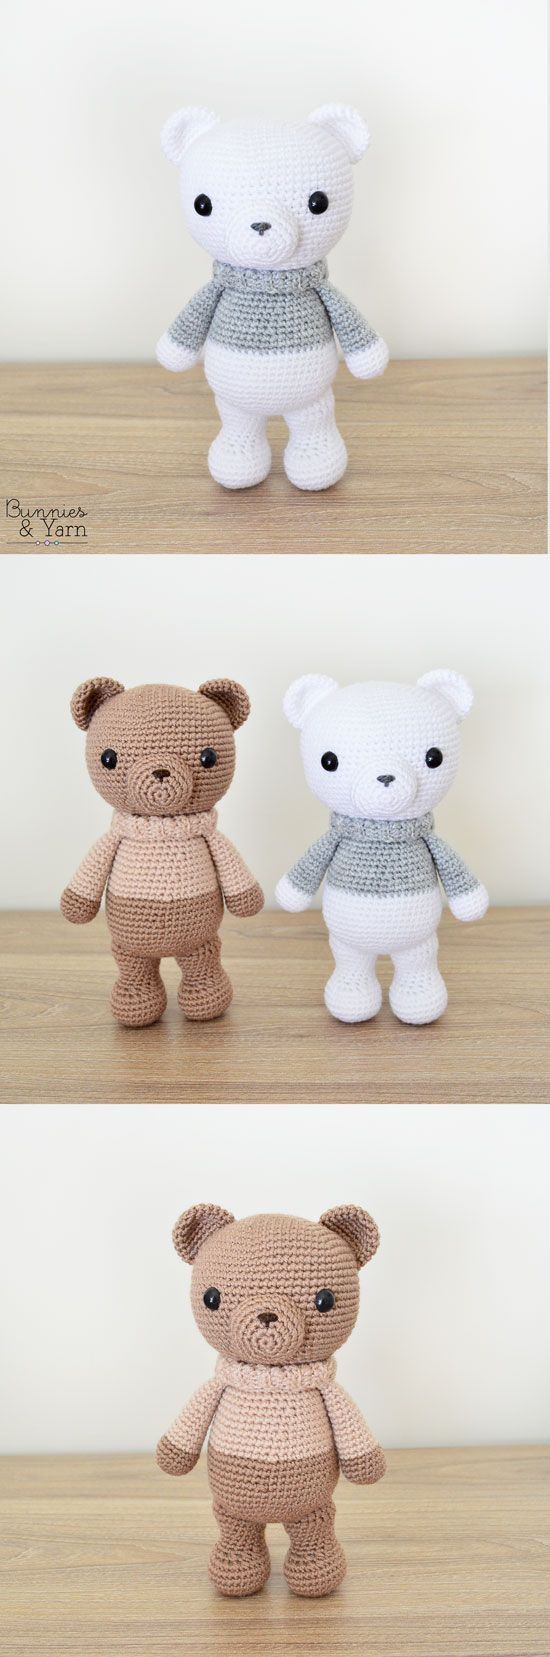 Crochet Pattern - Xander the Lovely Winter Bear - Amigurumi